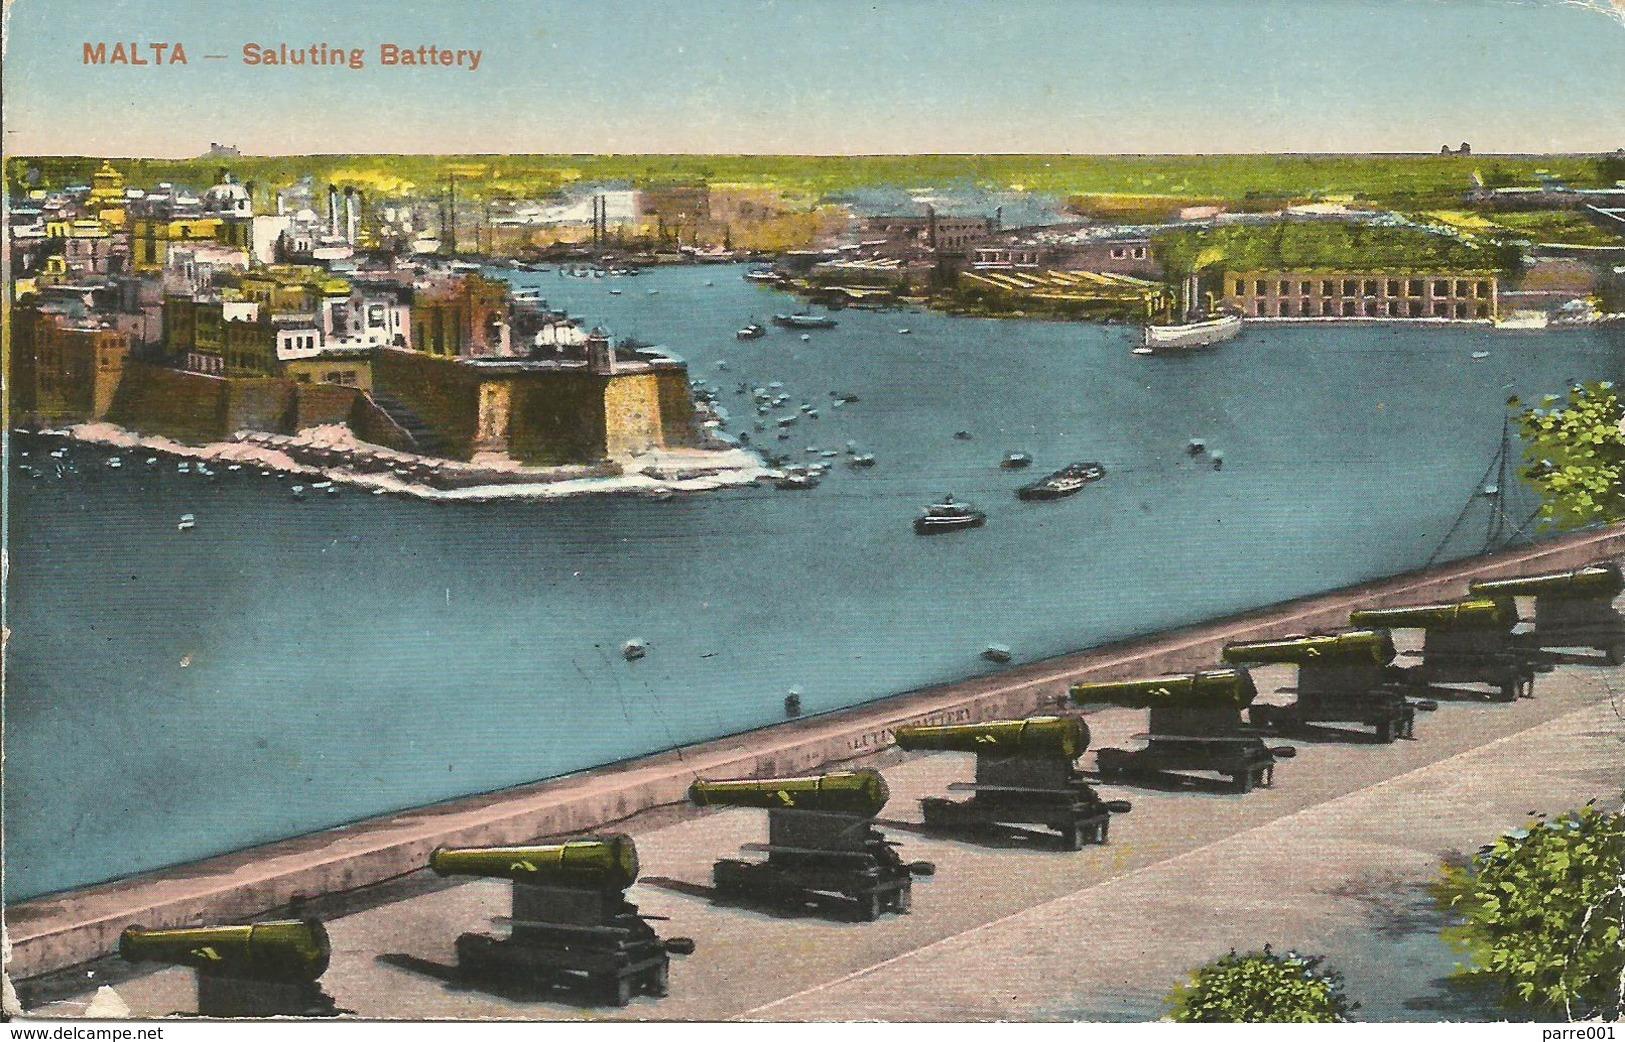 Malta 1914 POW-2 Prisoner Of War Hans Hagenberg POW No. 609 Verdala Barracks To Alexandria, Egypt. Early Use POW-2! - Malta